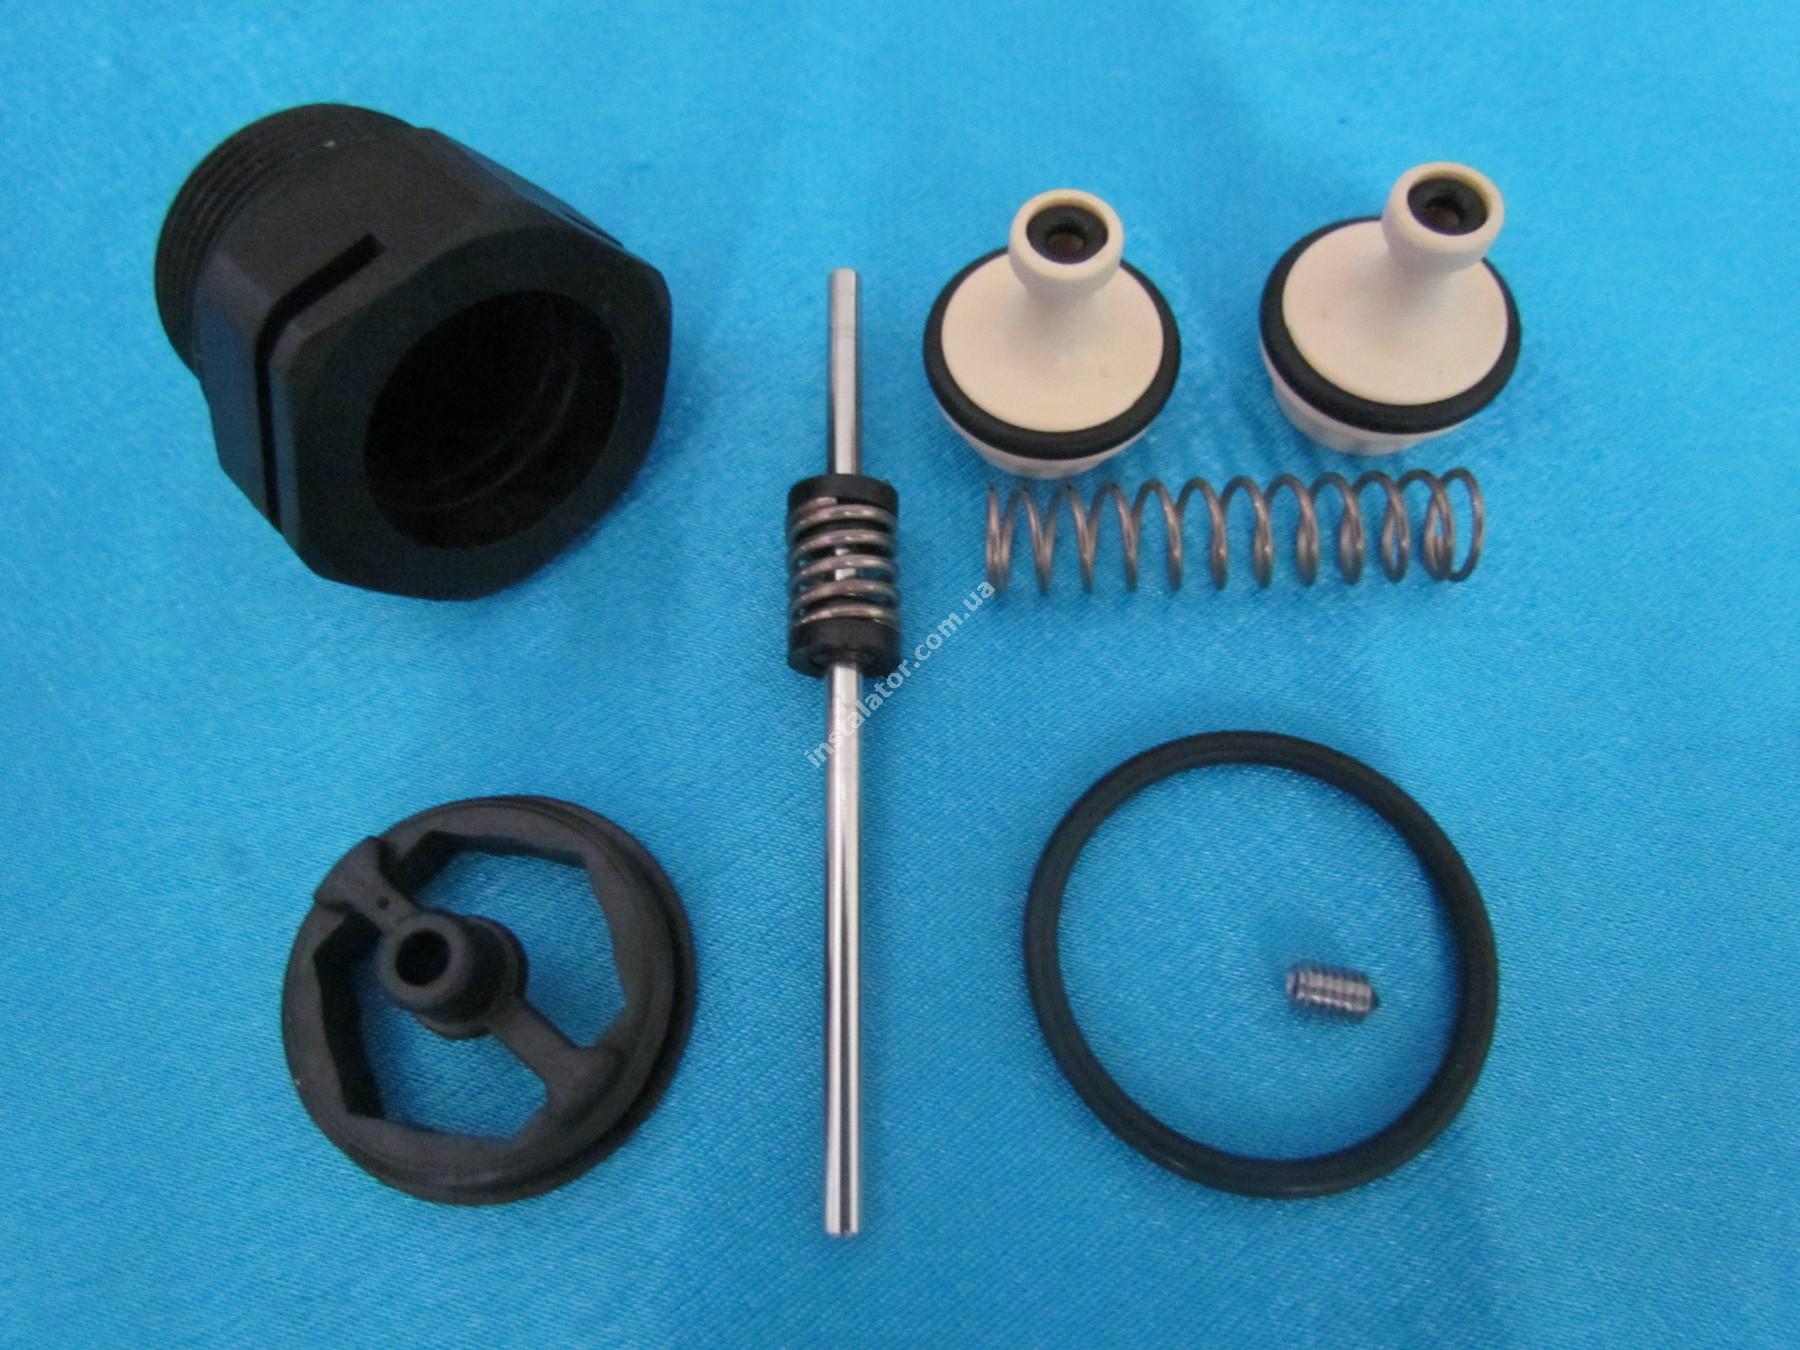 H010006037 Ремкомплект 3-х ходового клапана Micra 2 (новий) full-image-2